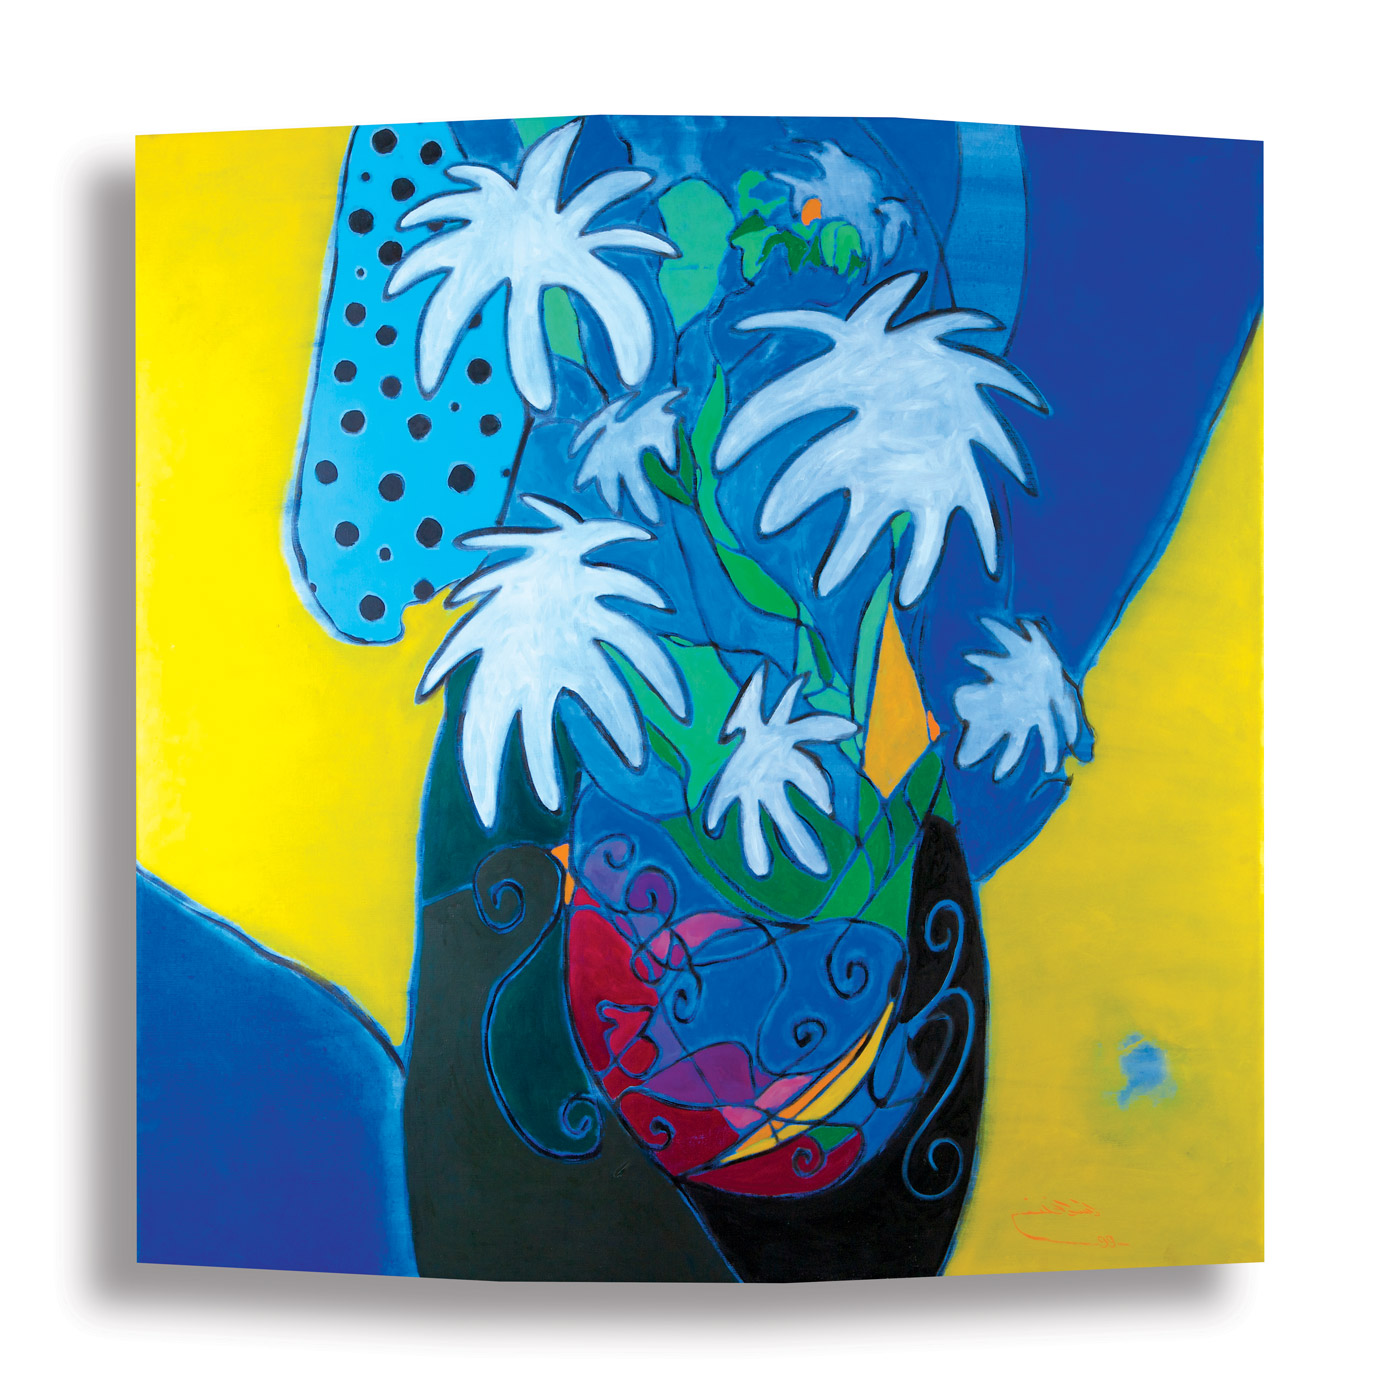 Fragmented-Abstraction--(2)_1999_Oil-on-canvas_168-x-168-cm rashid al khalifa